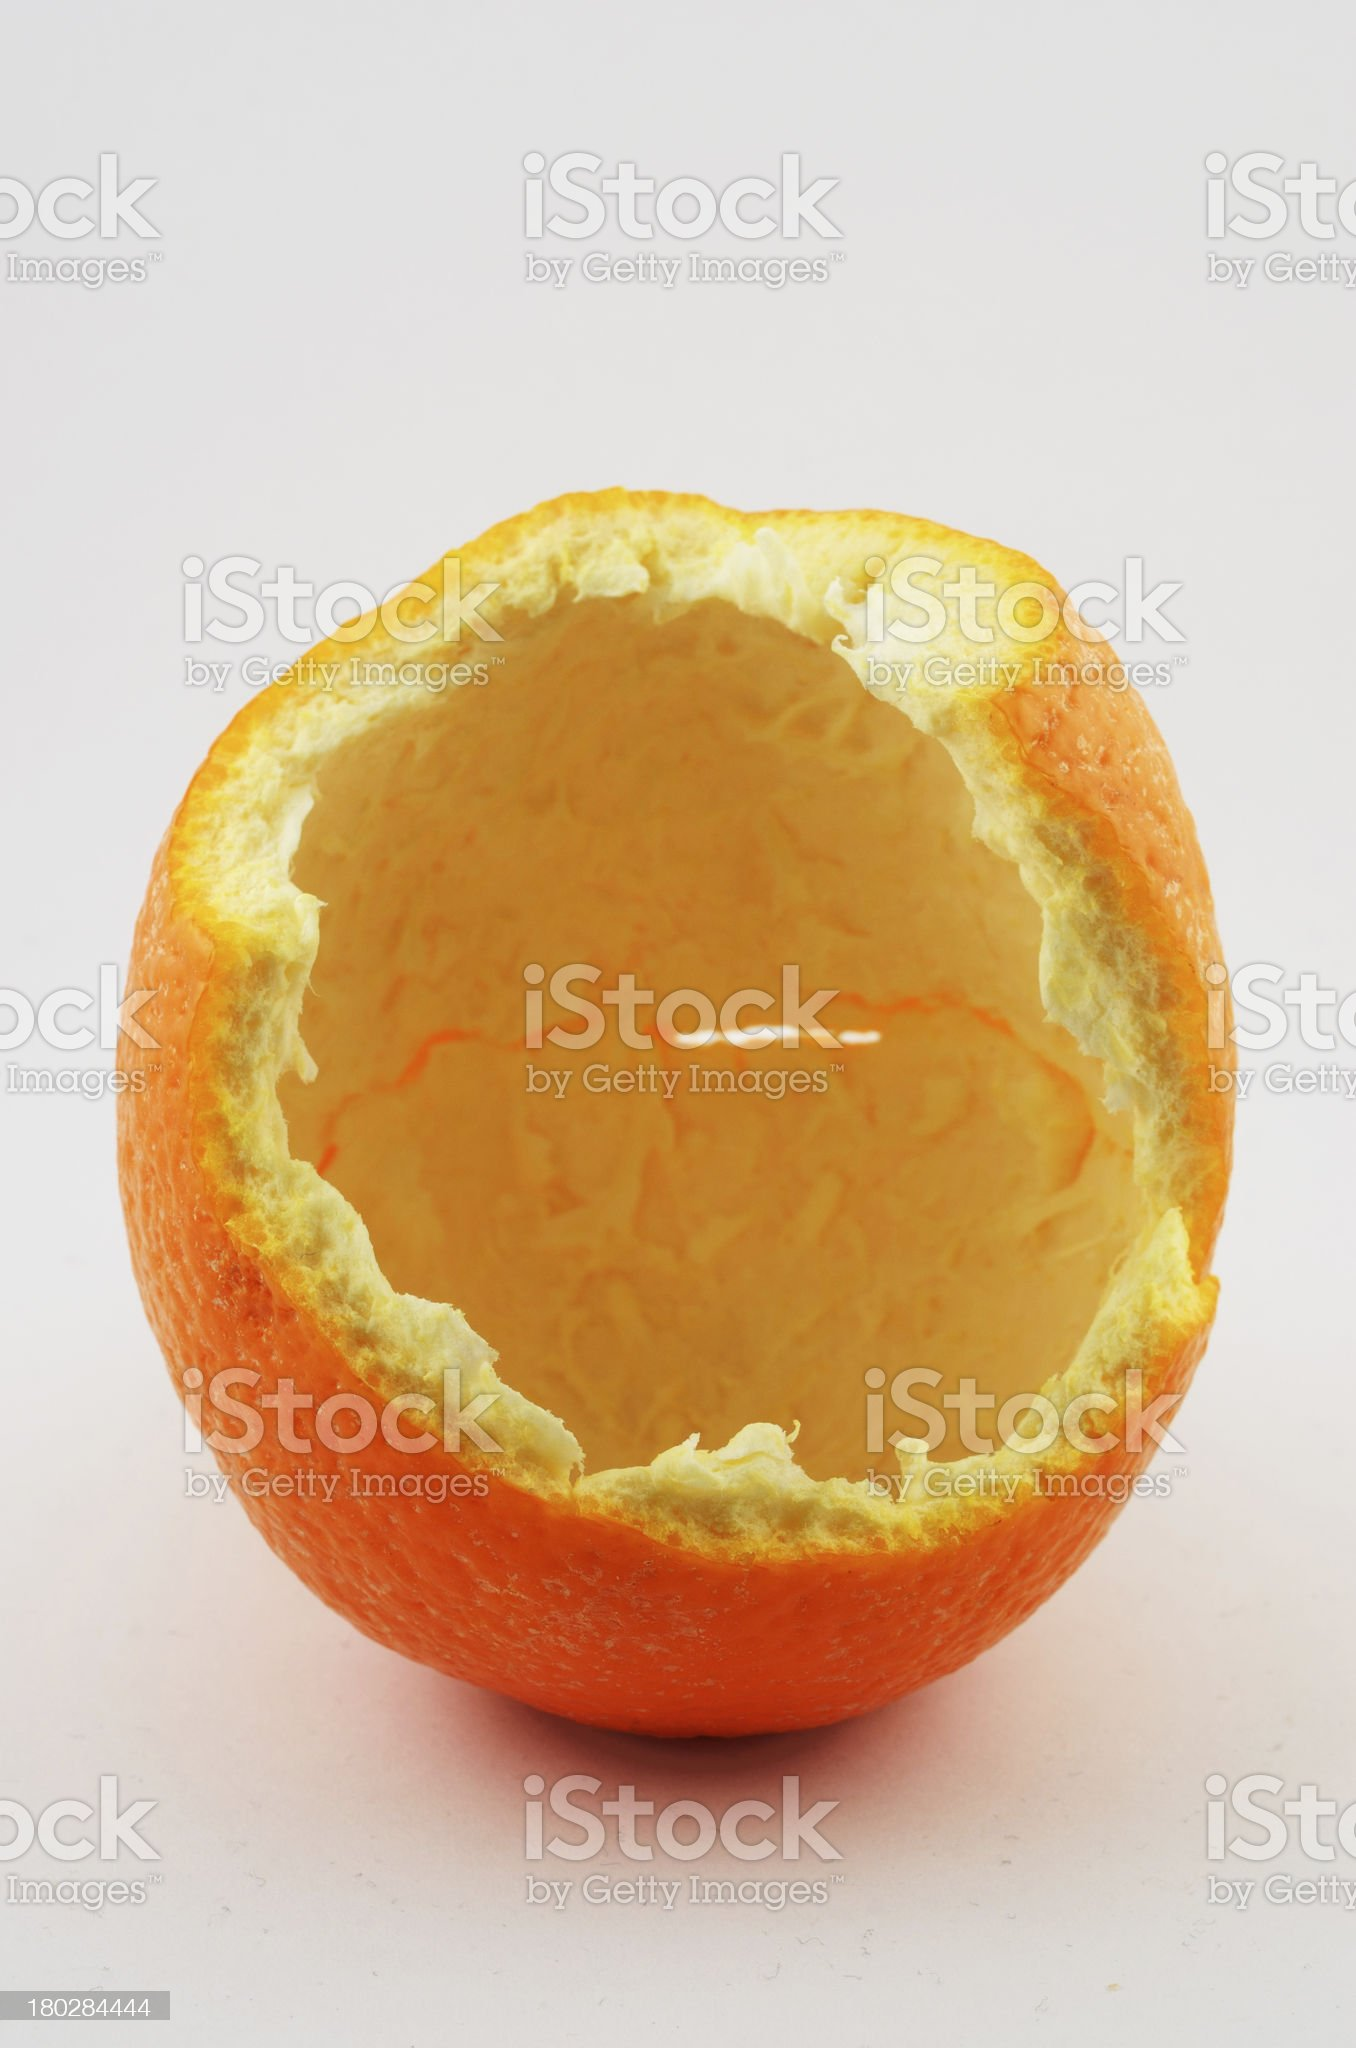 orange peel on a neutral background royalty-free stock photo